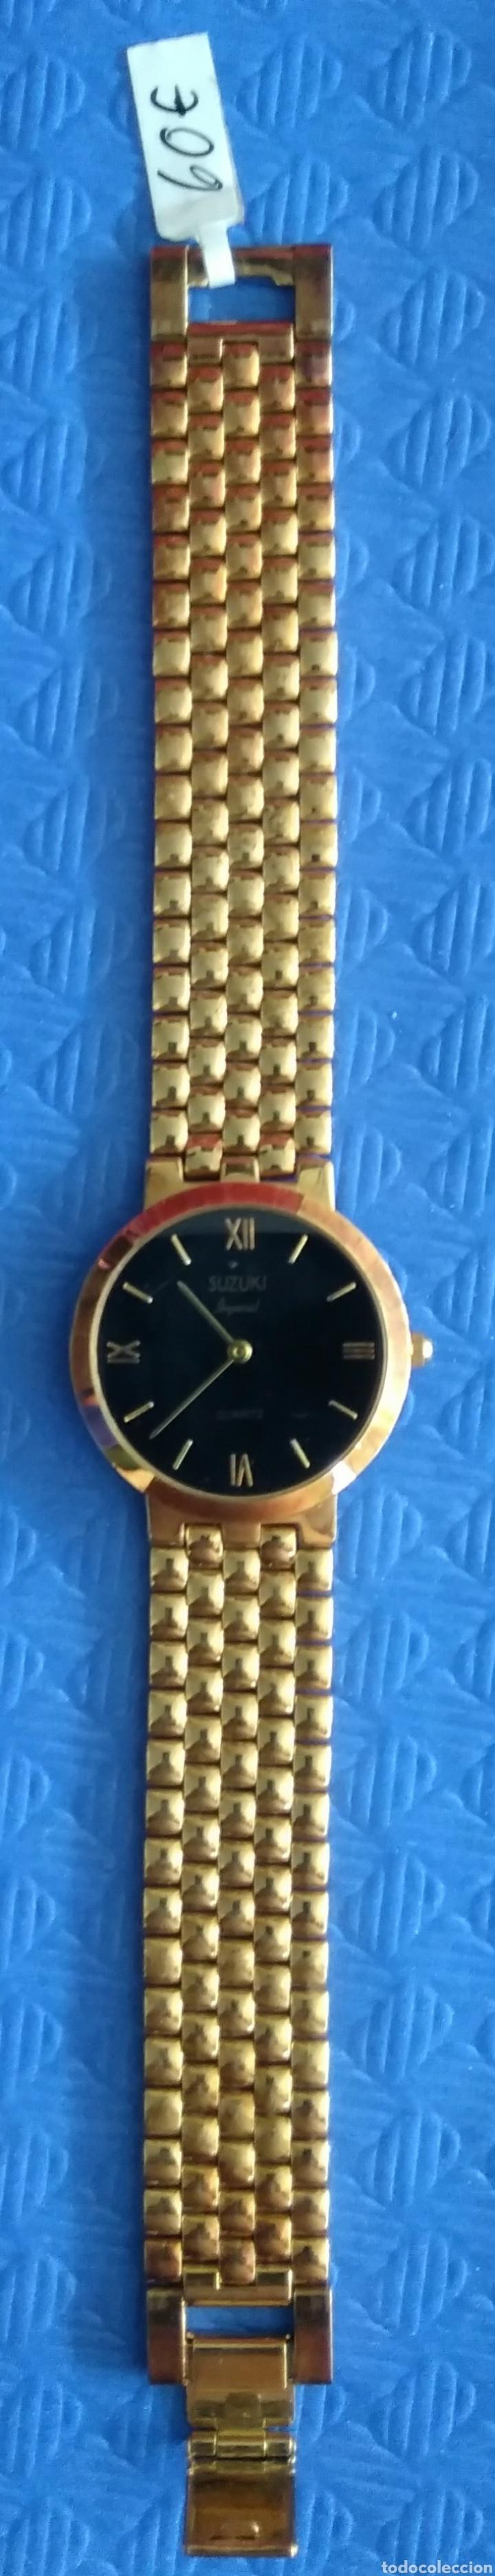 Relojes de pulsera: Reloj caballero Suzuki imperial chapado oro - Foto 2 - 167847209